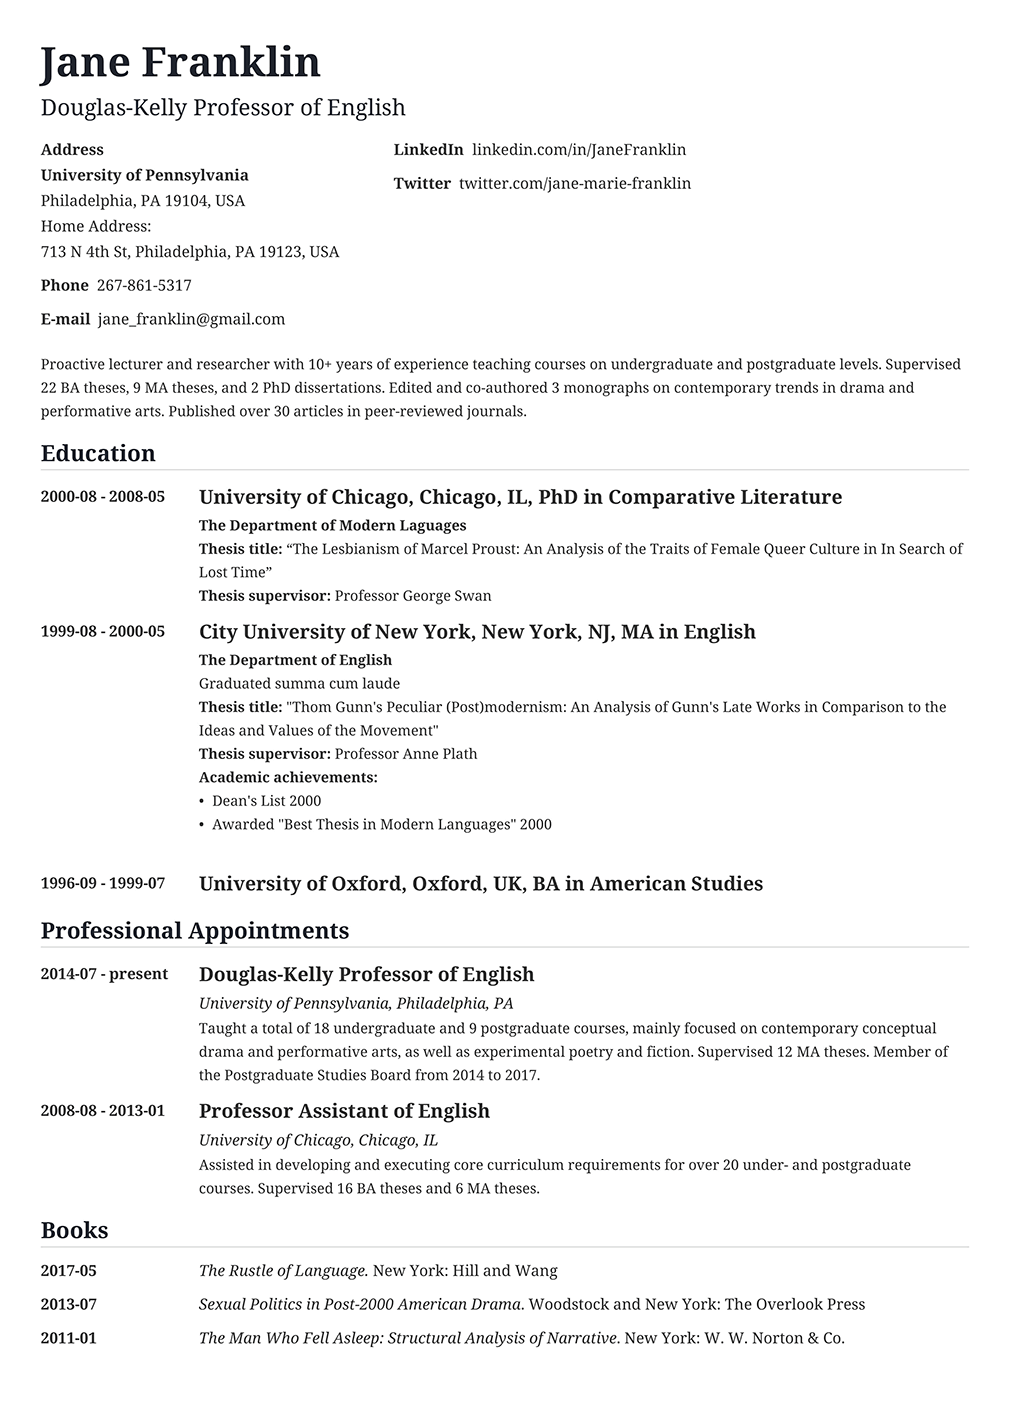 Contoh Cv Bahasa Inggris Paling Lengkap Dan Menarik